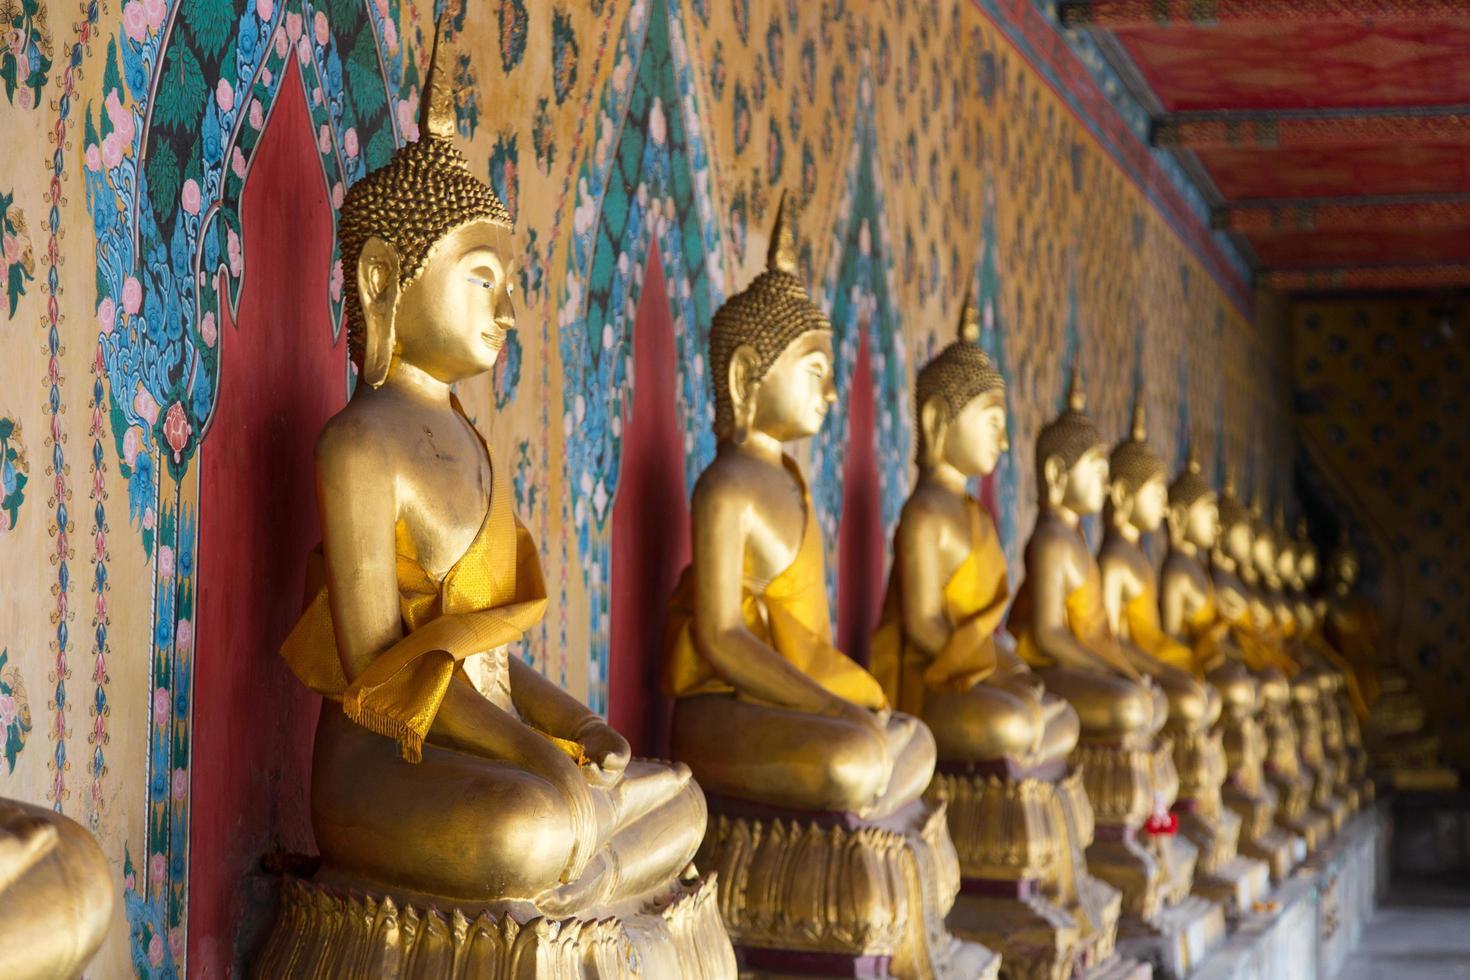 Buddha-Statuen in einem Tempel in Bangkok foto